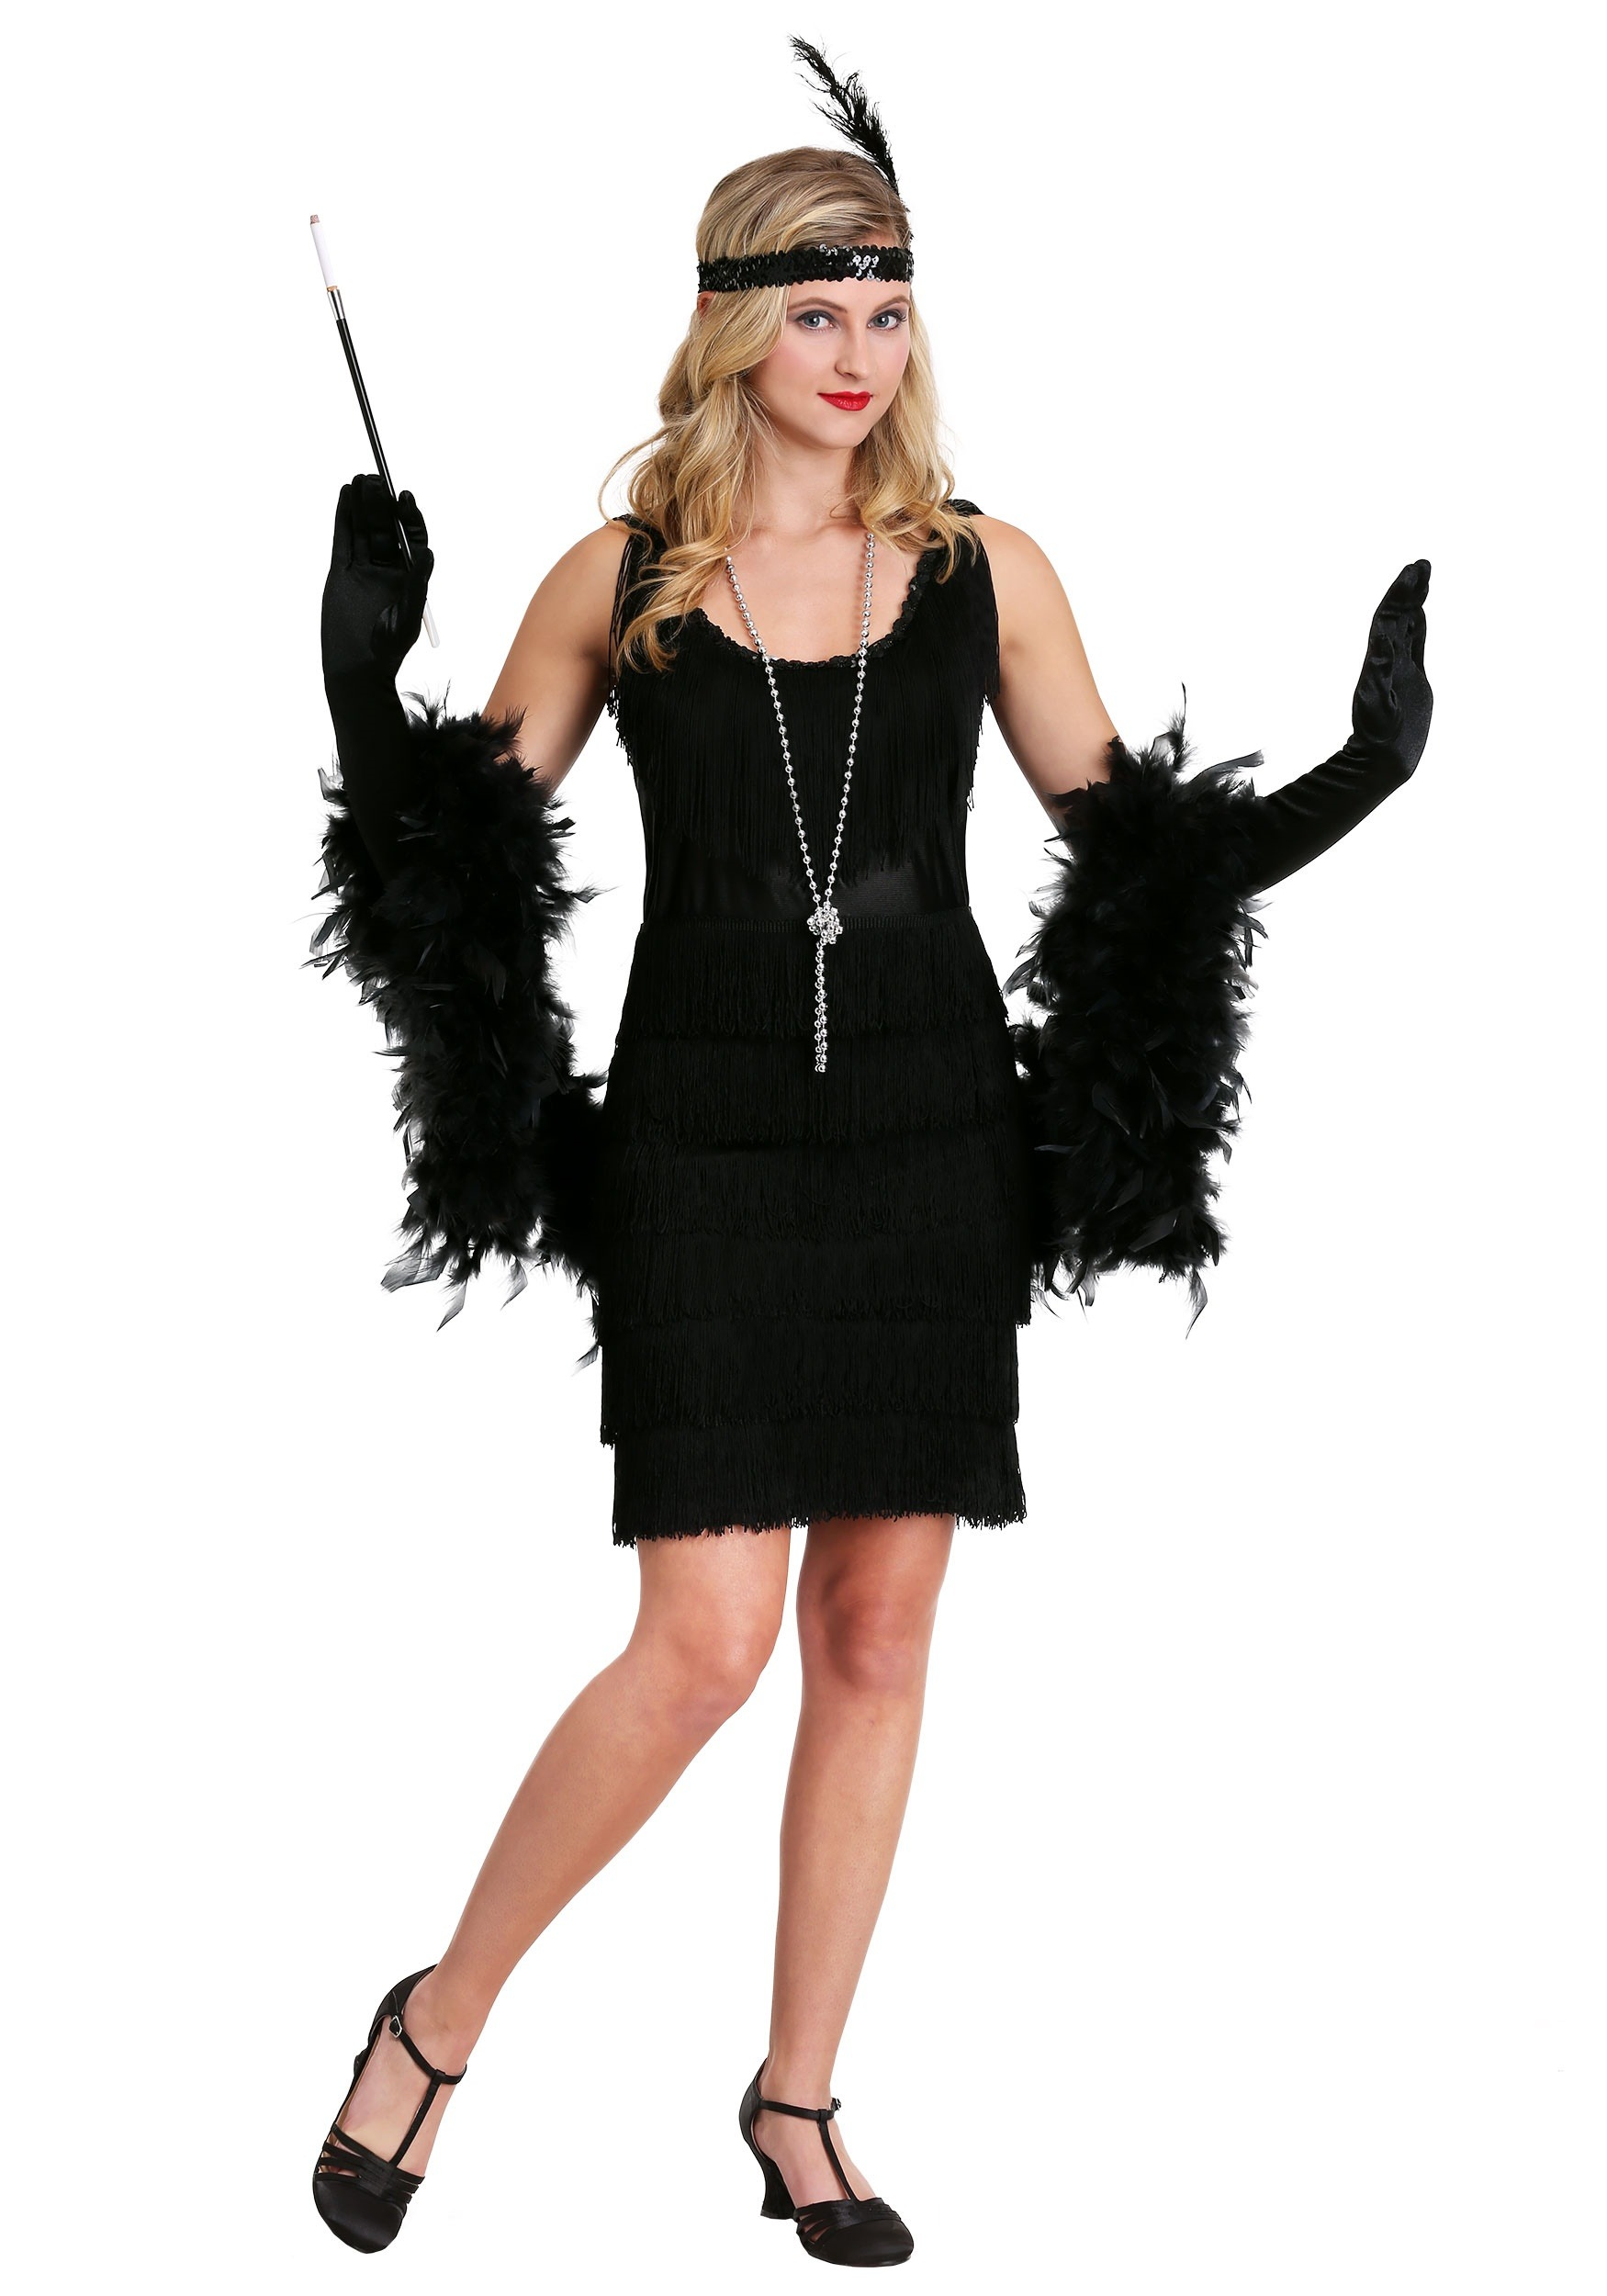 d0f206d82f4e7 Black Fringe 1920's Flapper Costume